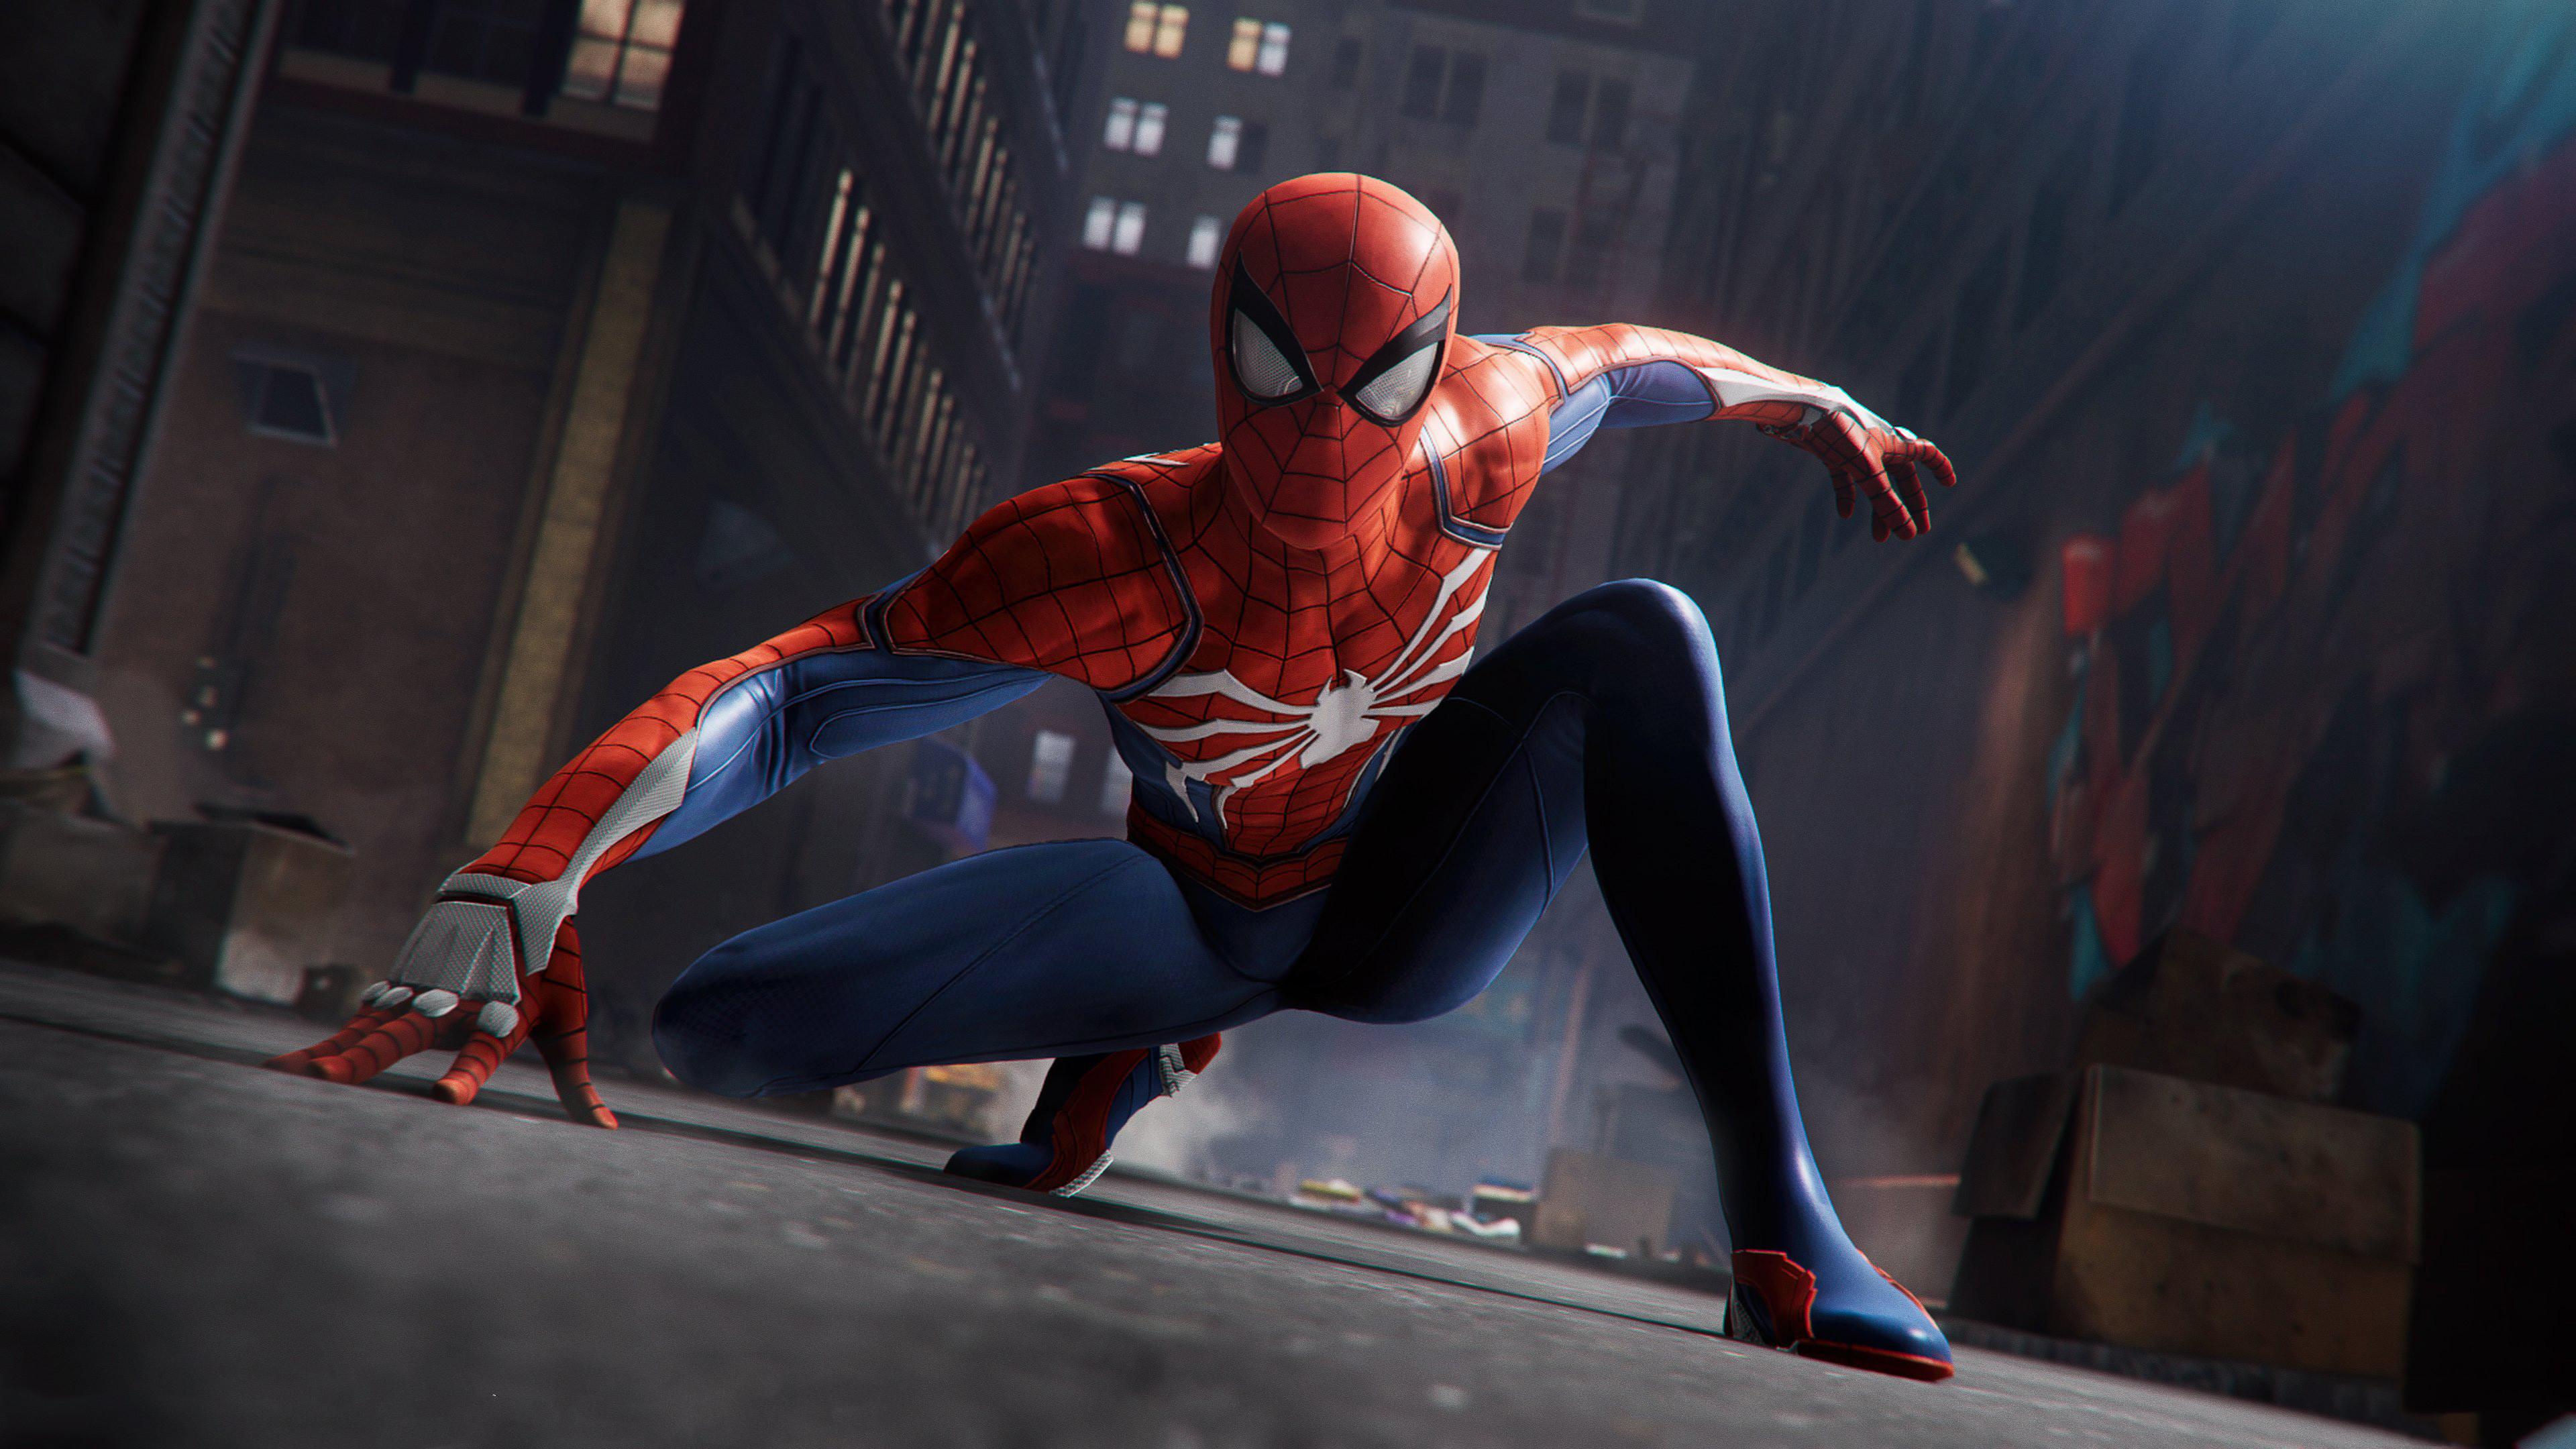 Hinh anh Spider Man dep